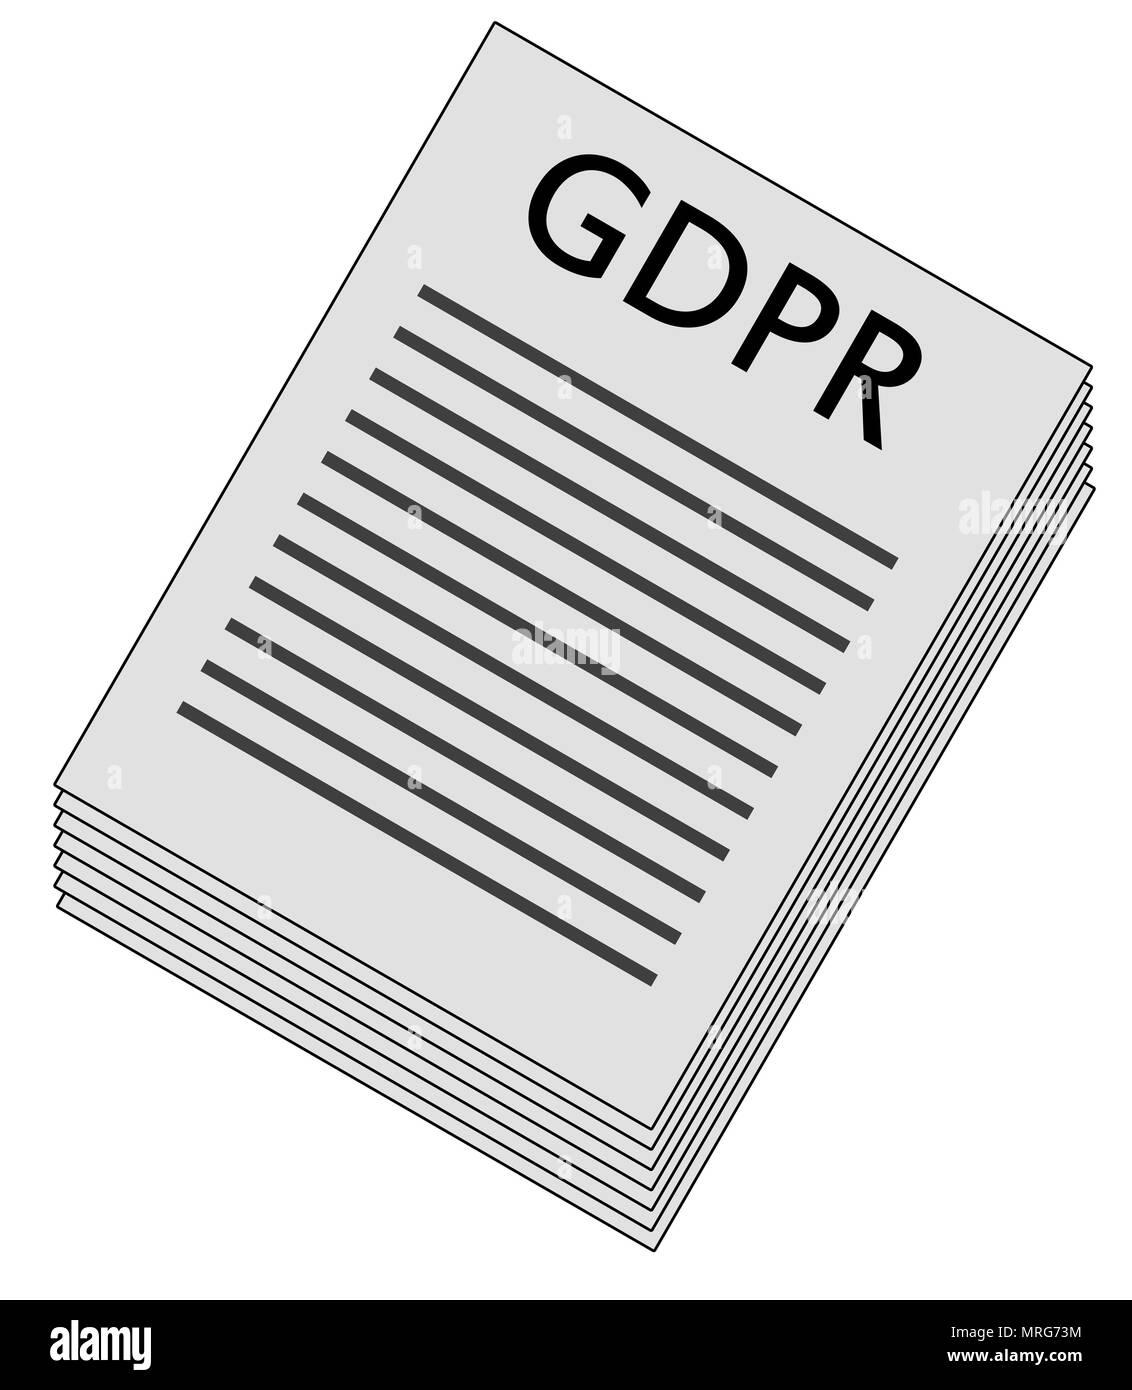 General Data Protection Regulation, paper stack illustration - Stock Image